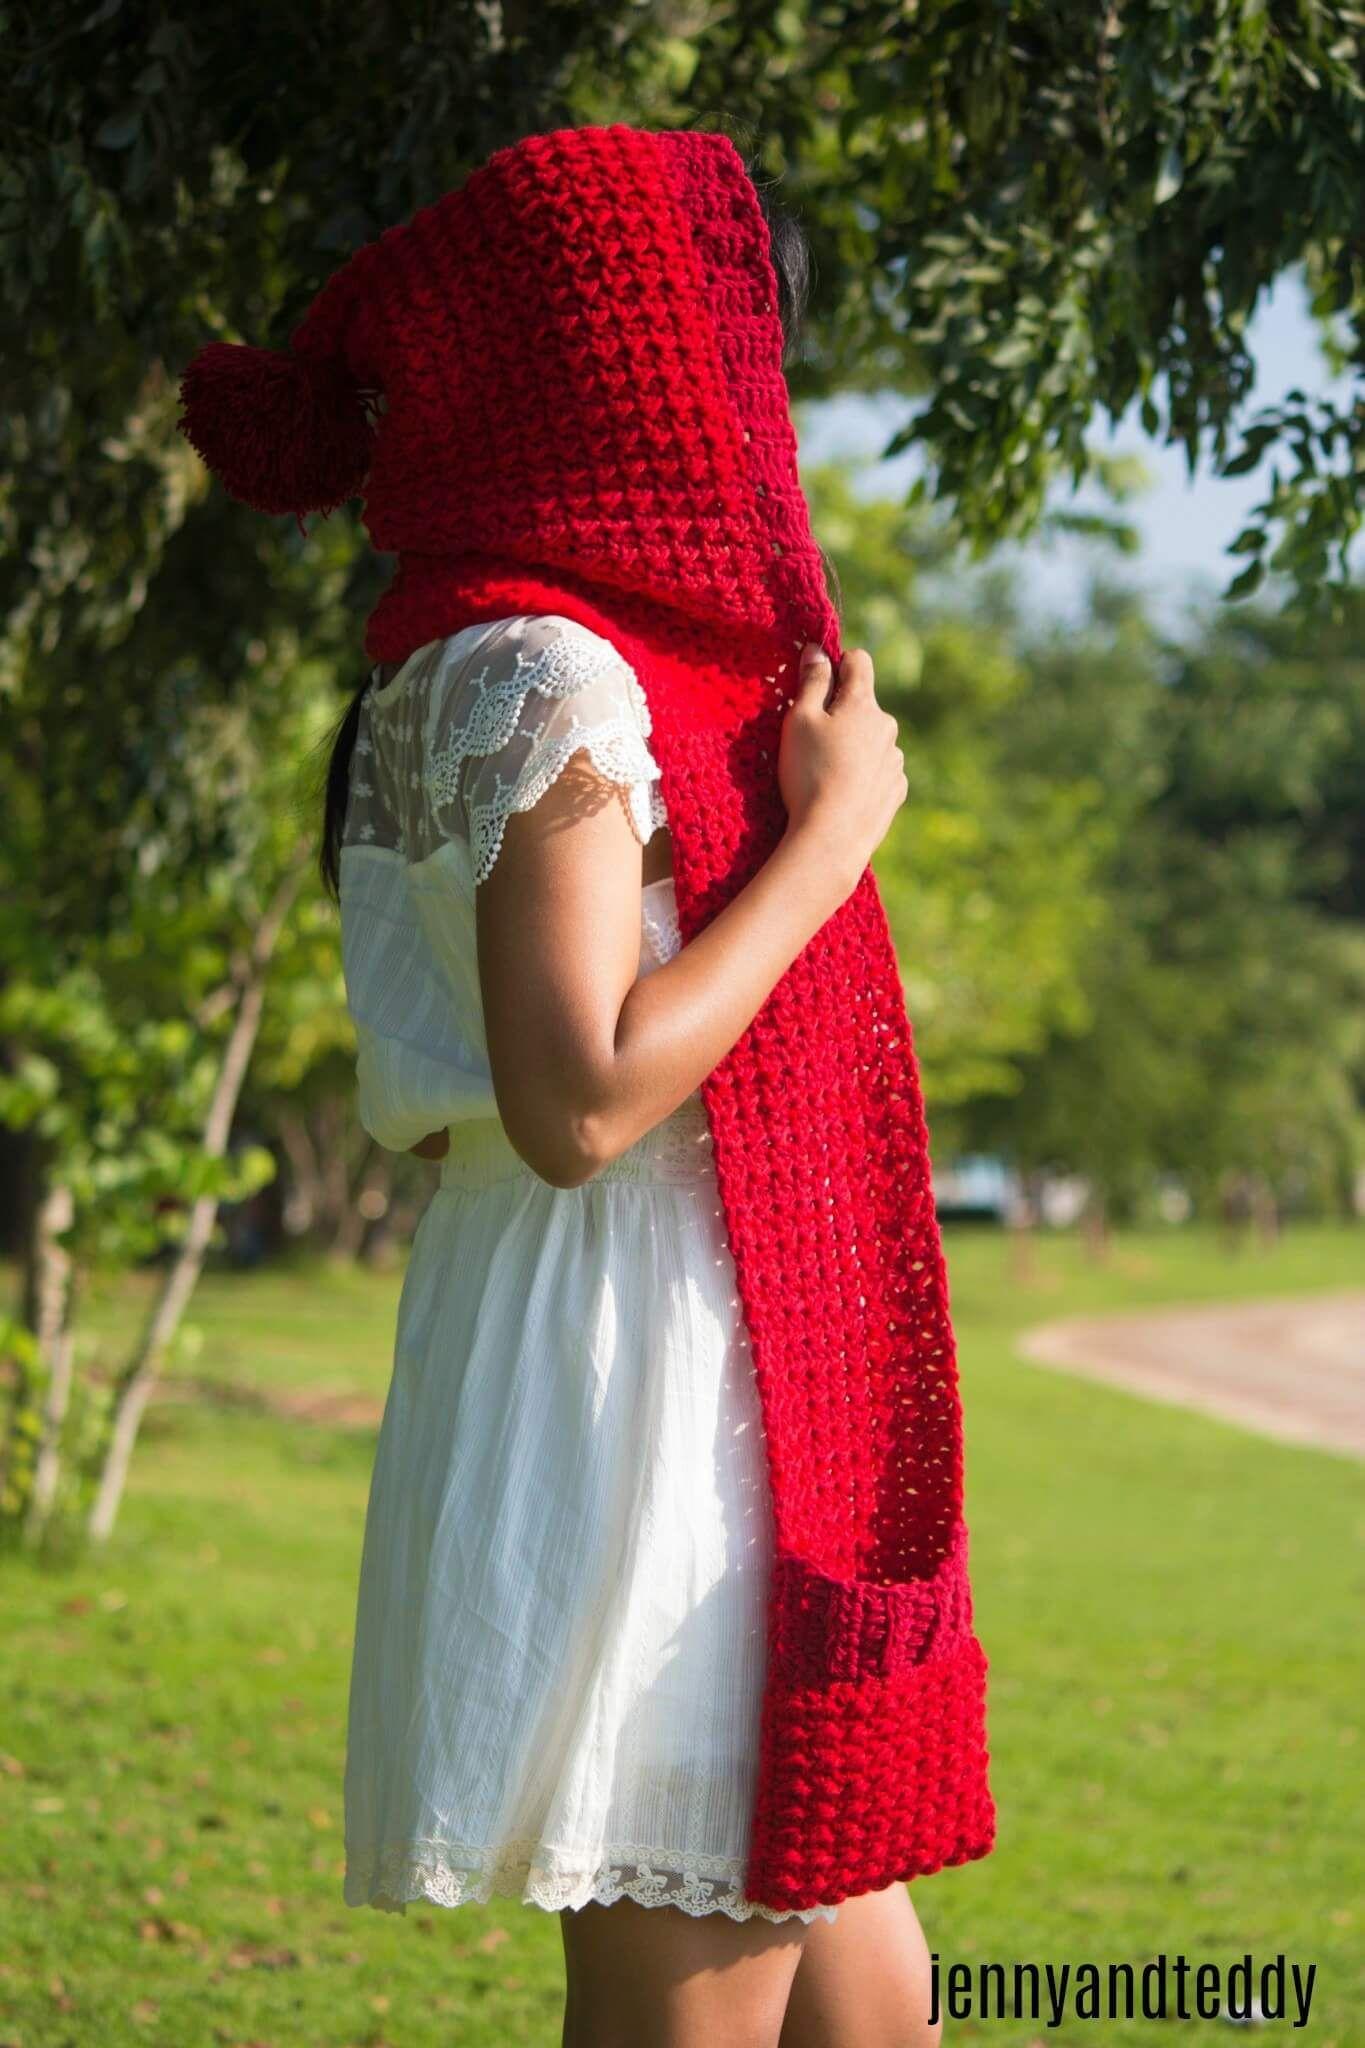 1little red riding hood crochet hoodie hat scarf | Crochet ...